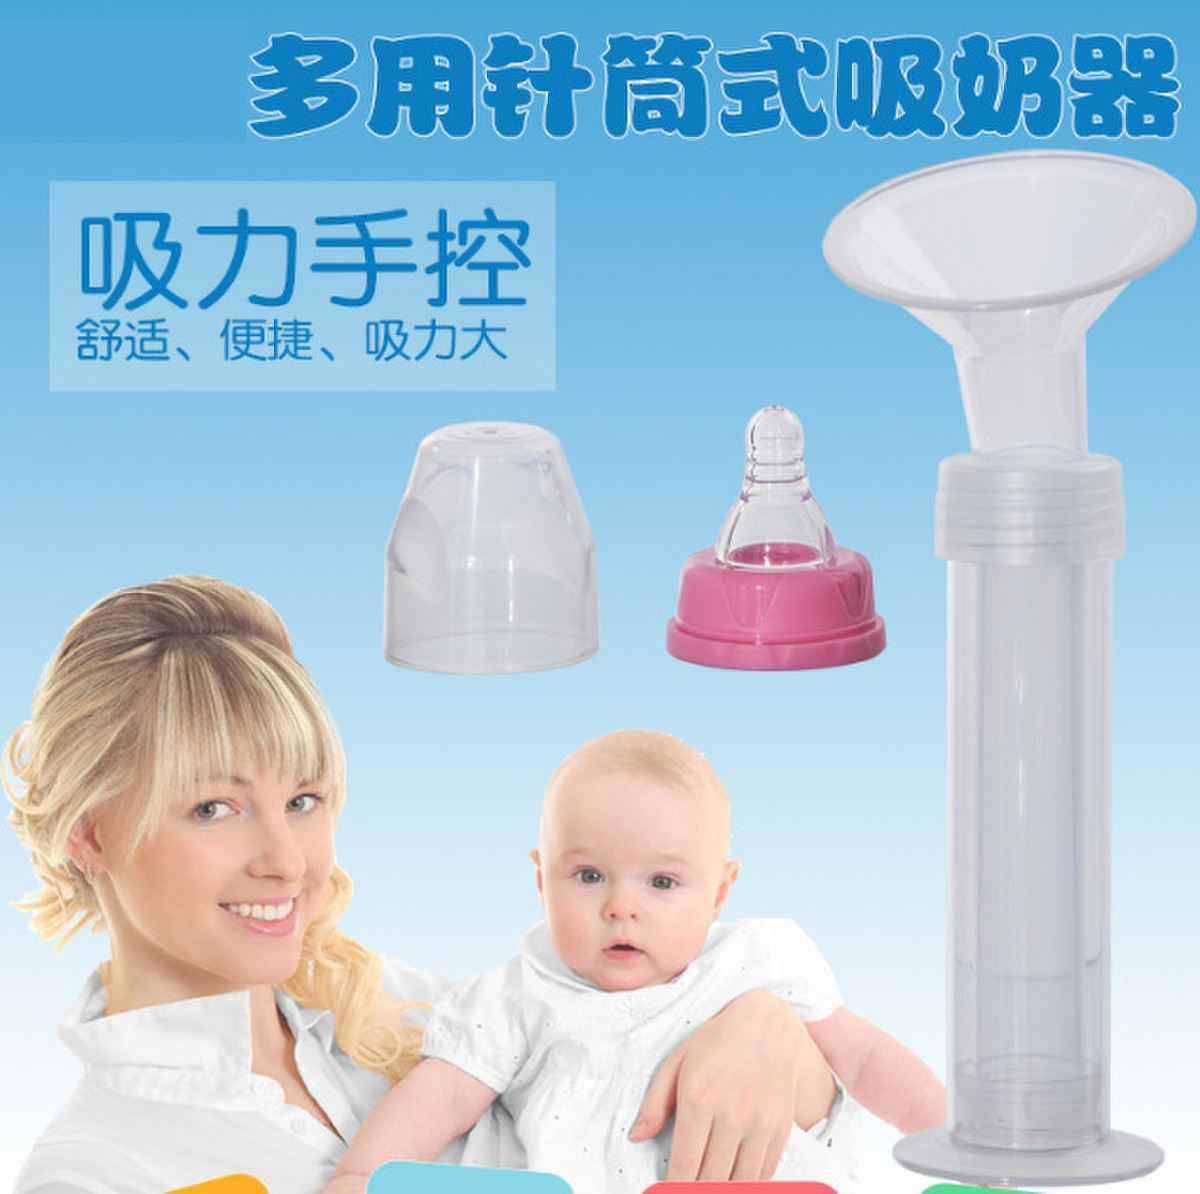 Milker Maternal Force Breast Milk Syringe Breast Pump Straw Kids Pacifier Pregnancy And Birth Milking Manual Needle Feeding Bott